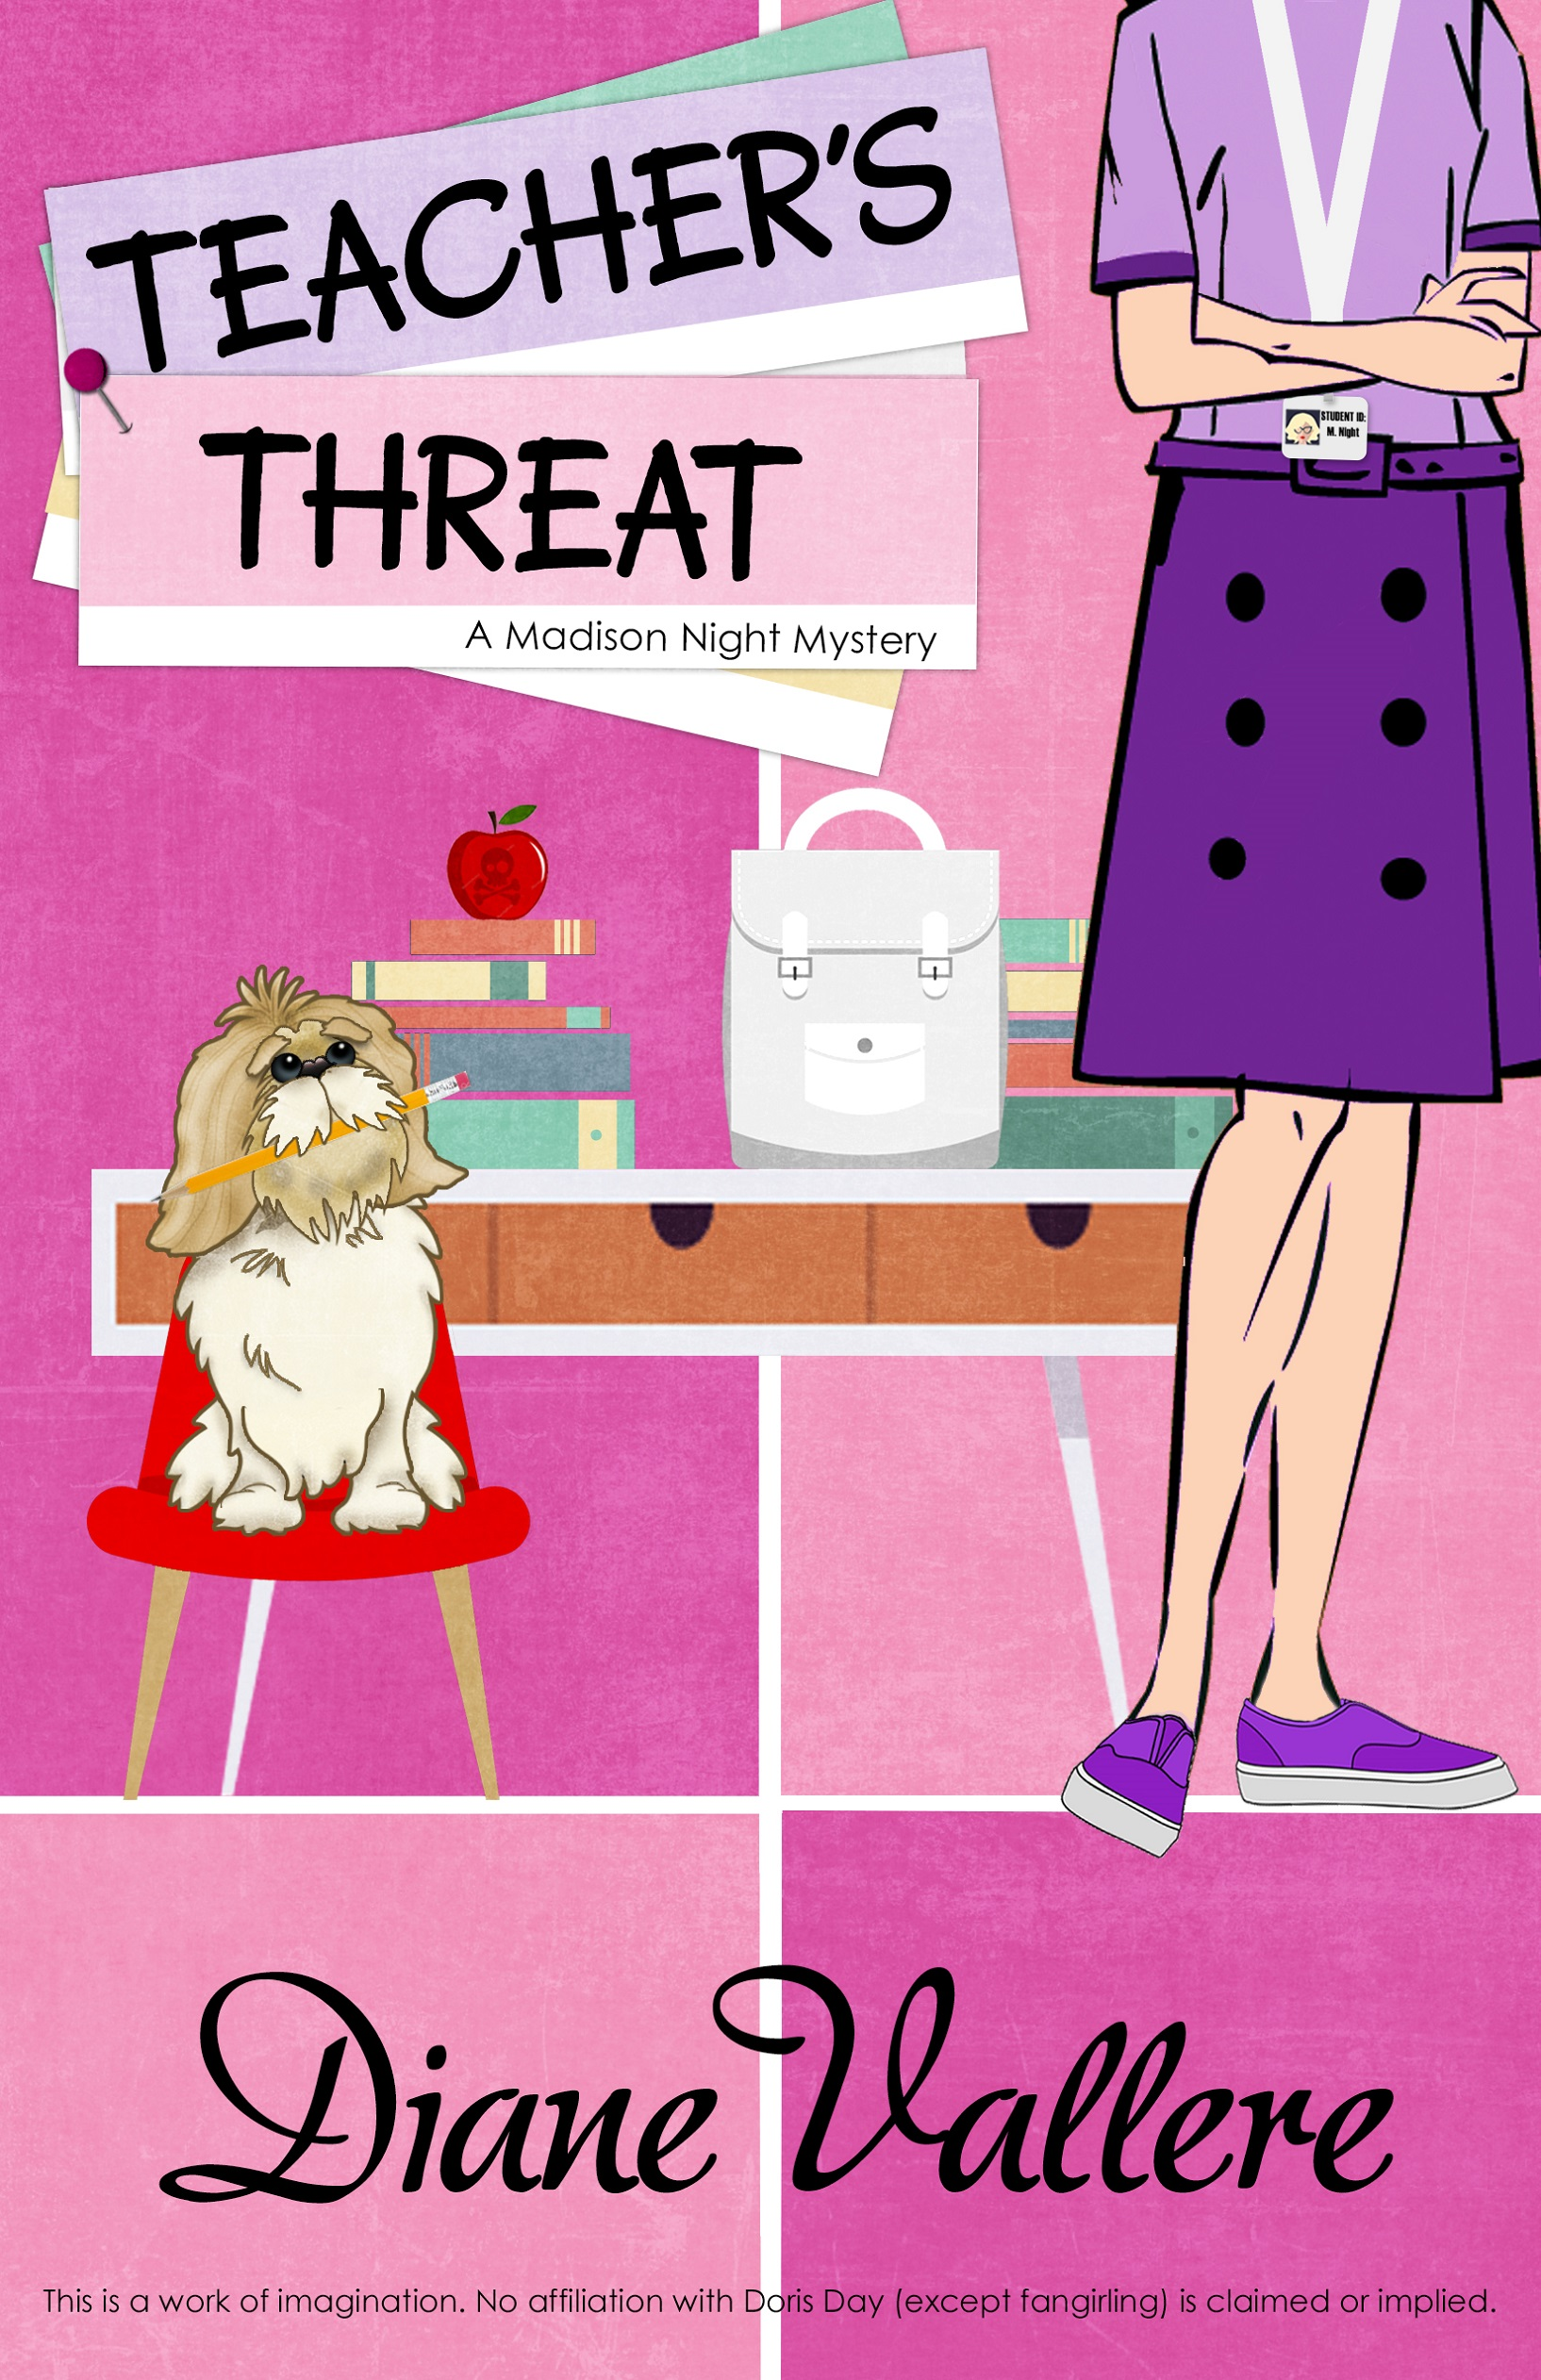 Teacher's Threat